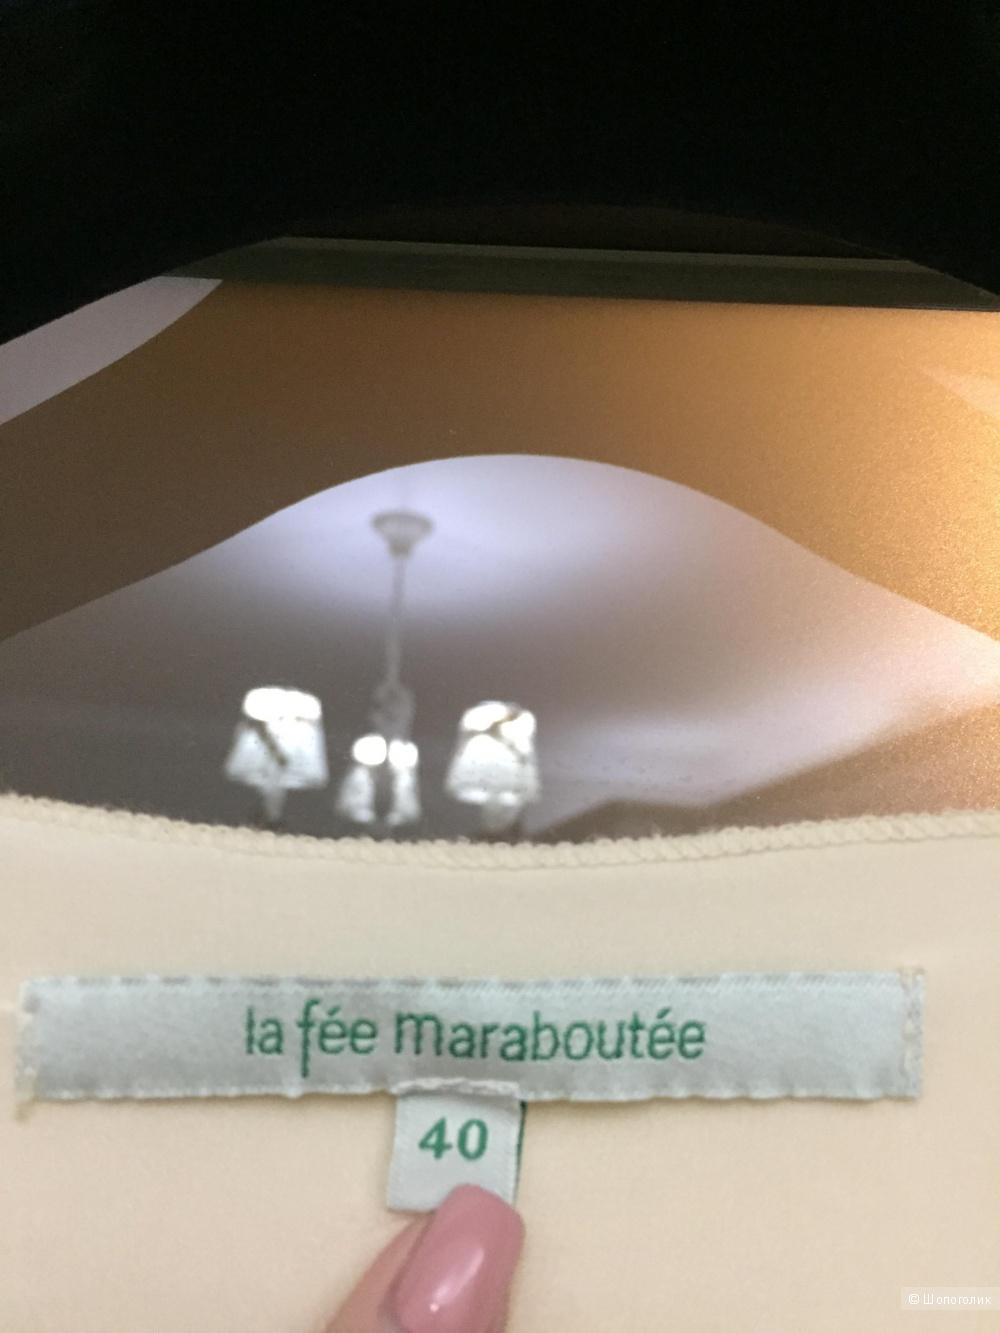 Платье La fee maraboutee 40 Евр/46 рос